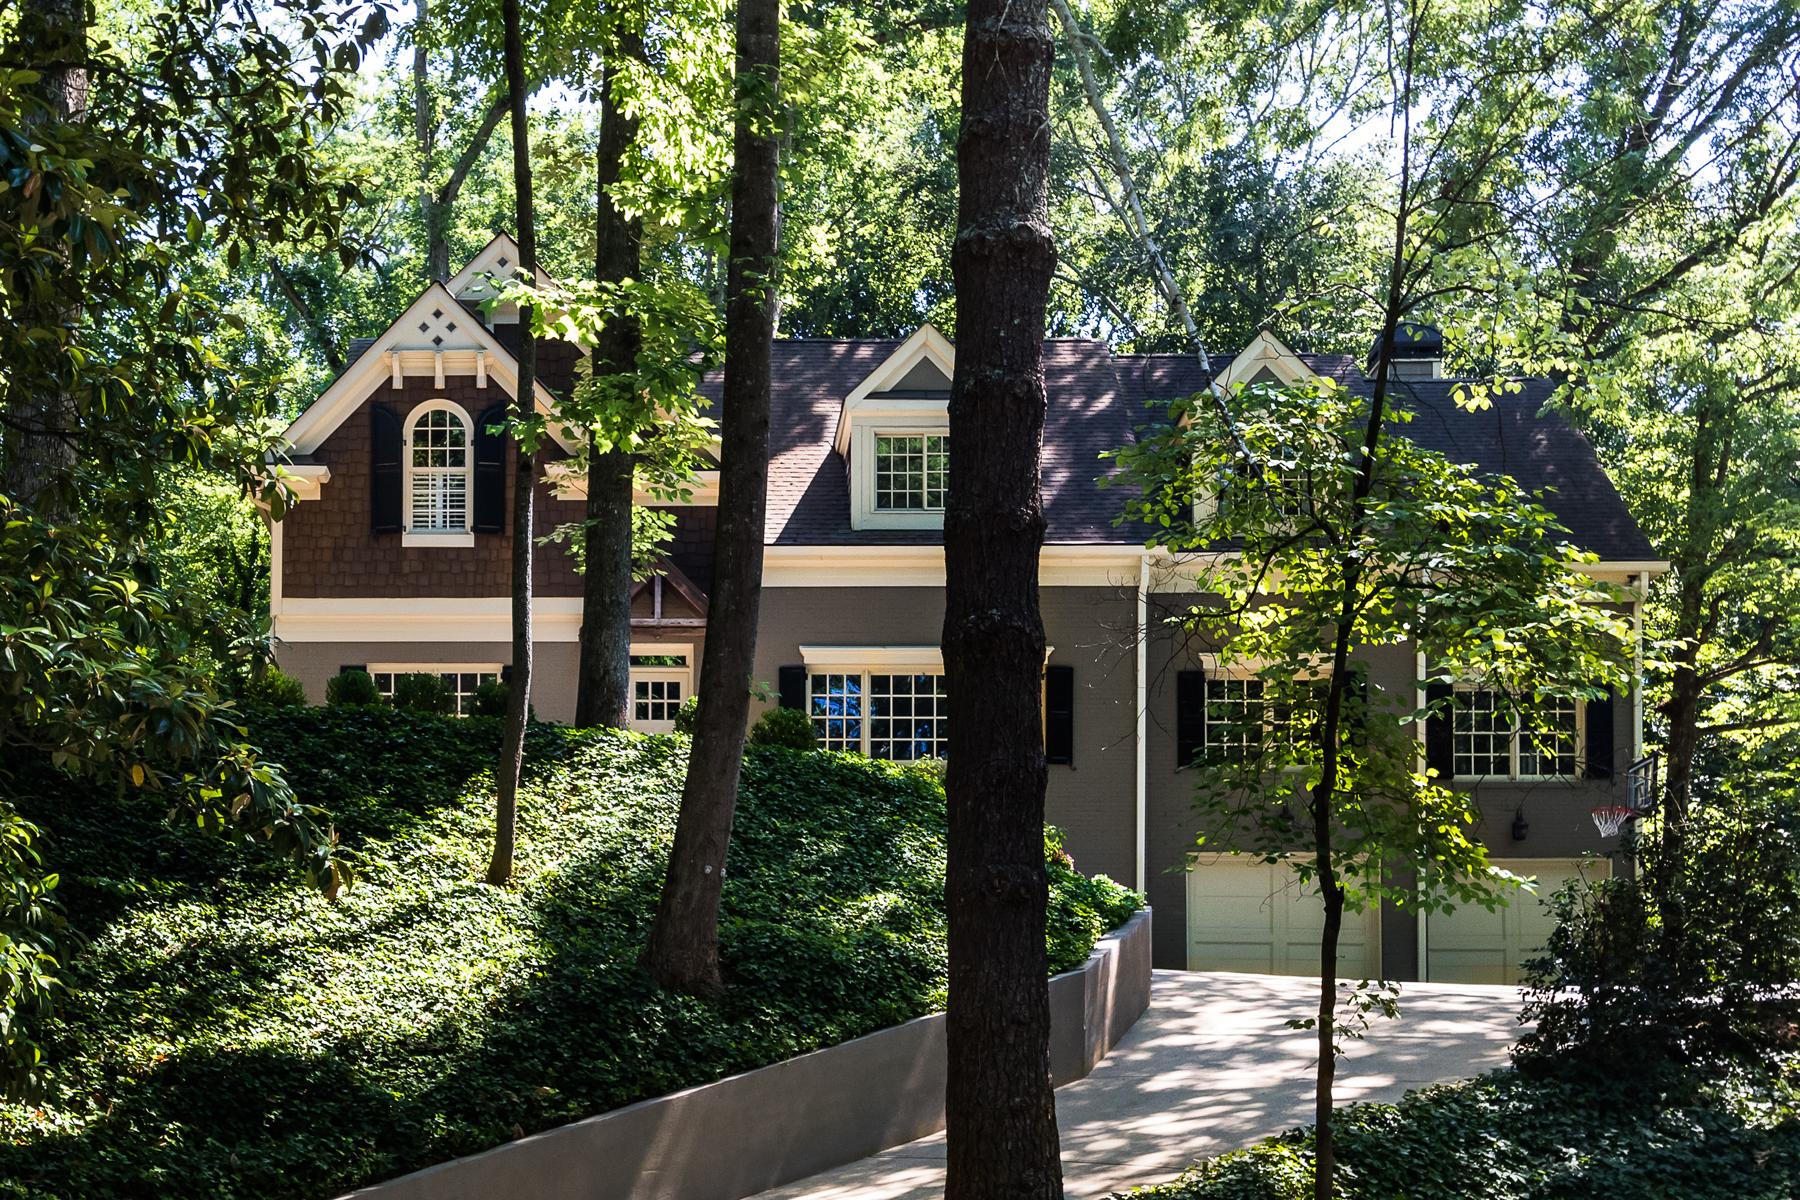 Single Family Home for Sale at Flawless Renovation In Sarah Smith 3996 Land O Lakes Drive NE Atlanta, Georgia, 30342 United States